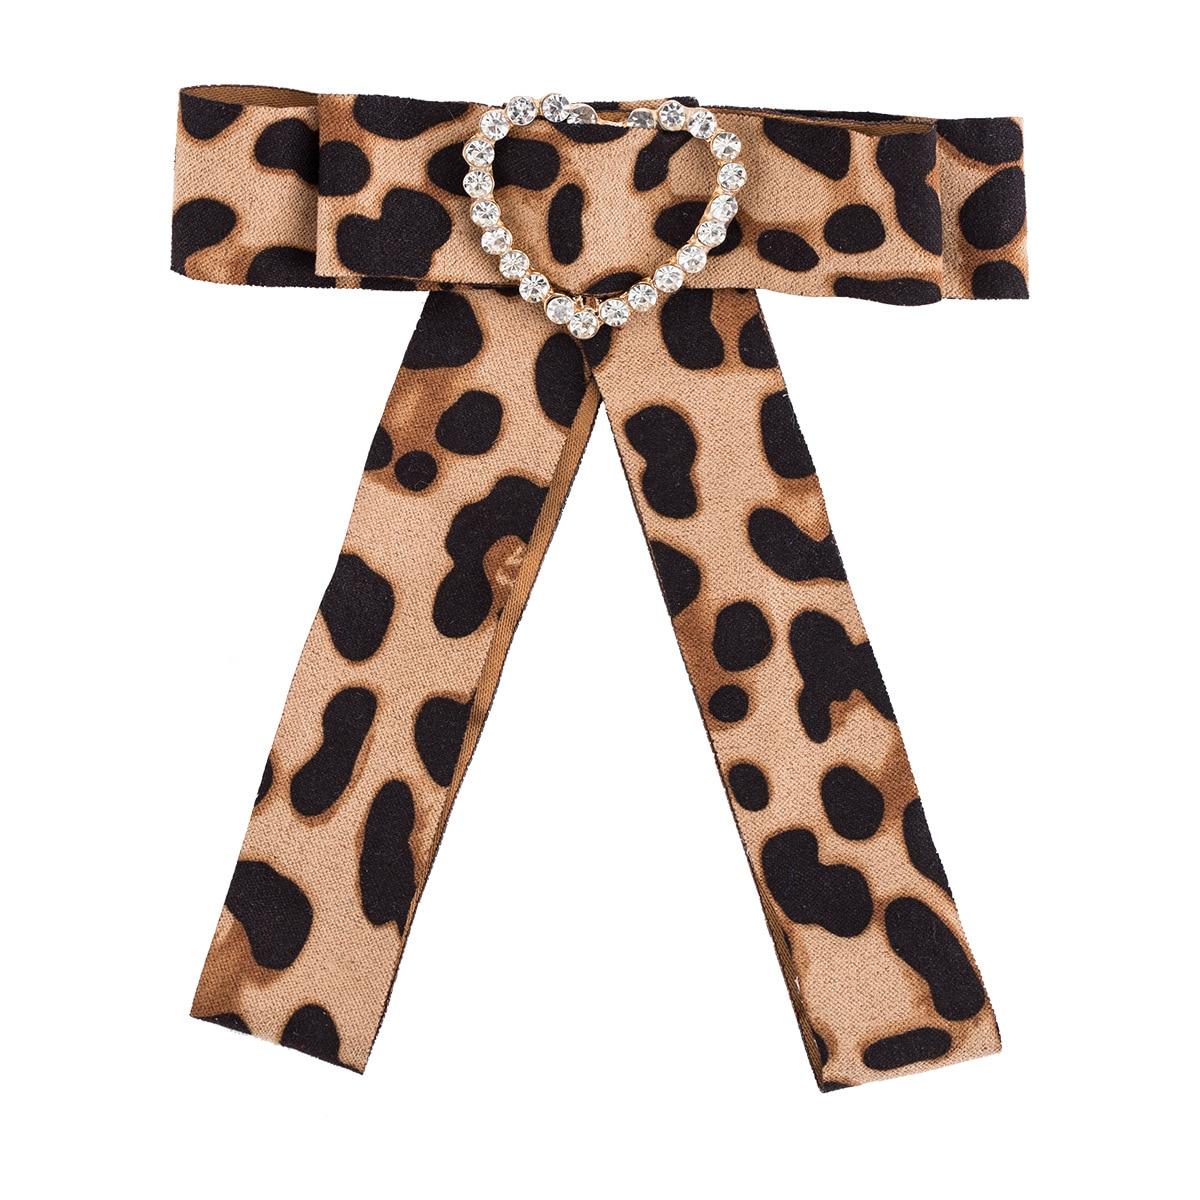 New Sexy European Brooch Pins Long Big Leopard Print Fabric Bowties Women Crystal Heart Bow Ties Neck Collar Wholesale Christmas